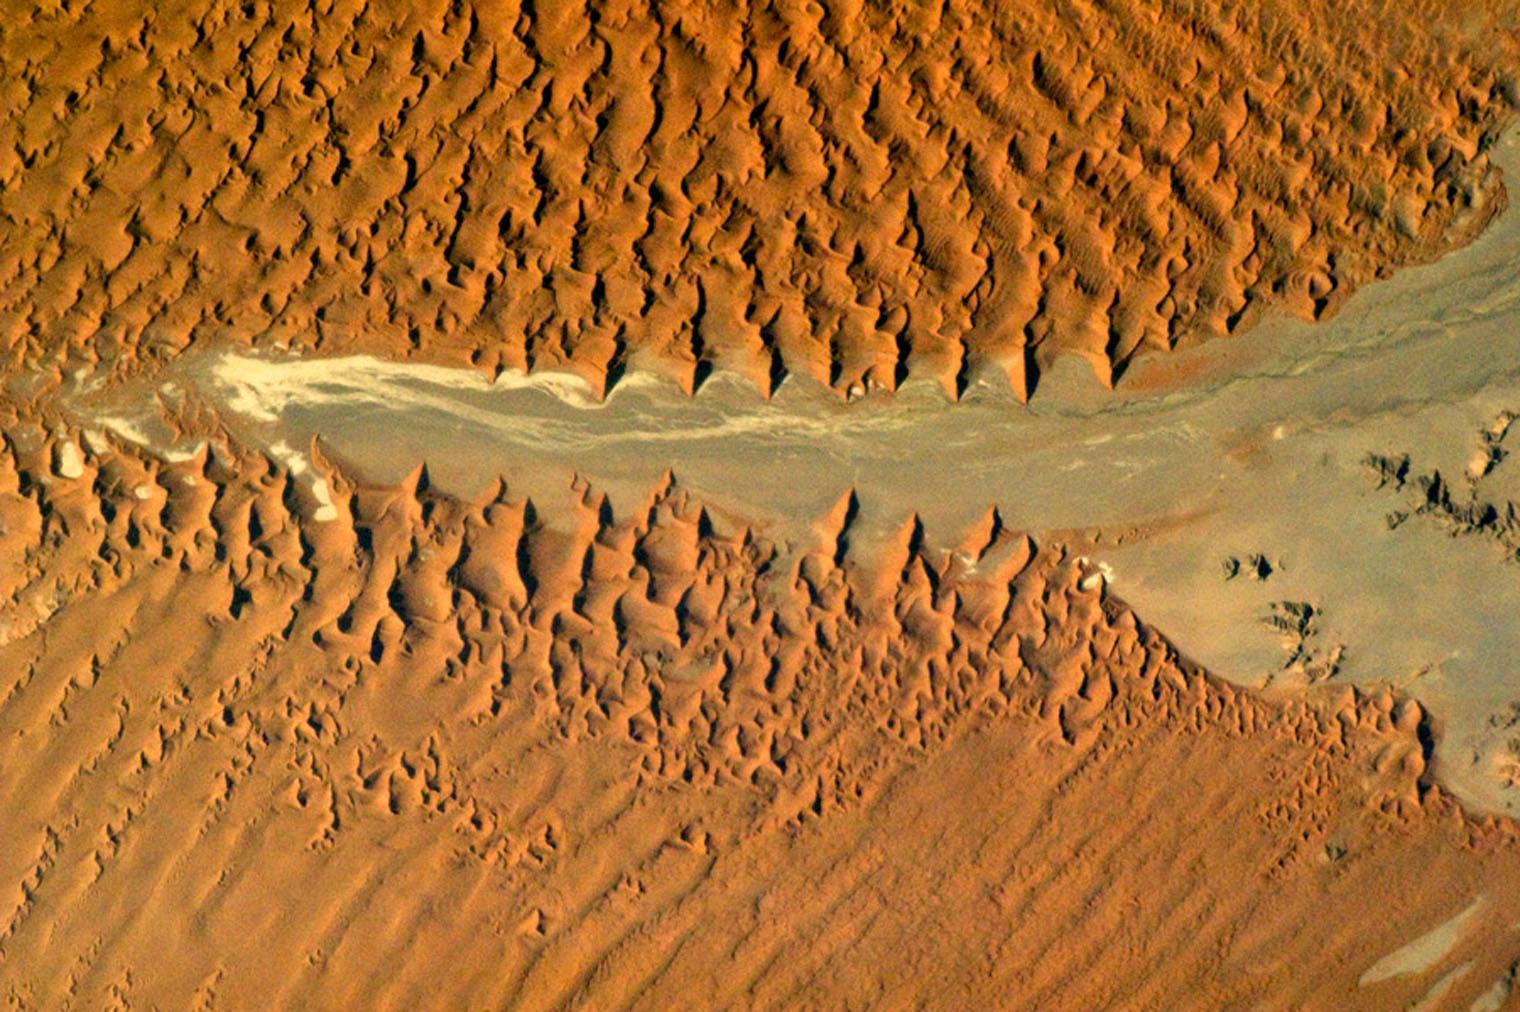 Arid rock, Namibia